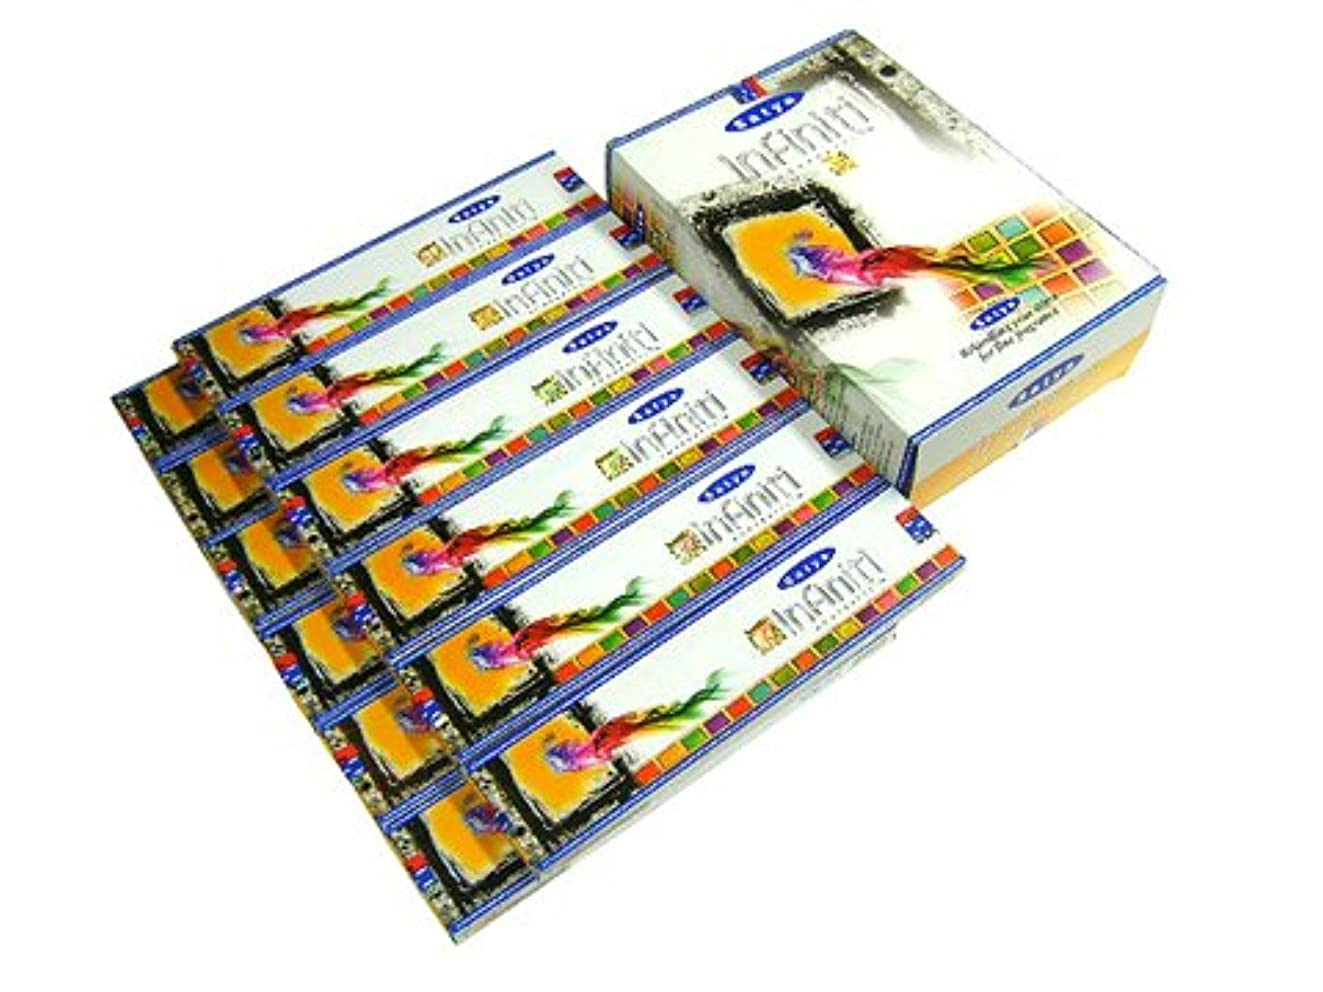 SATYA(サチャ) インフィニティ香 スティック INFINITI 12箱セット